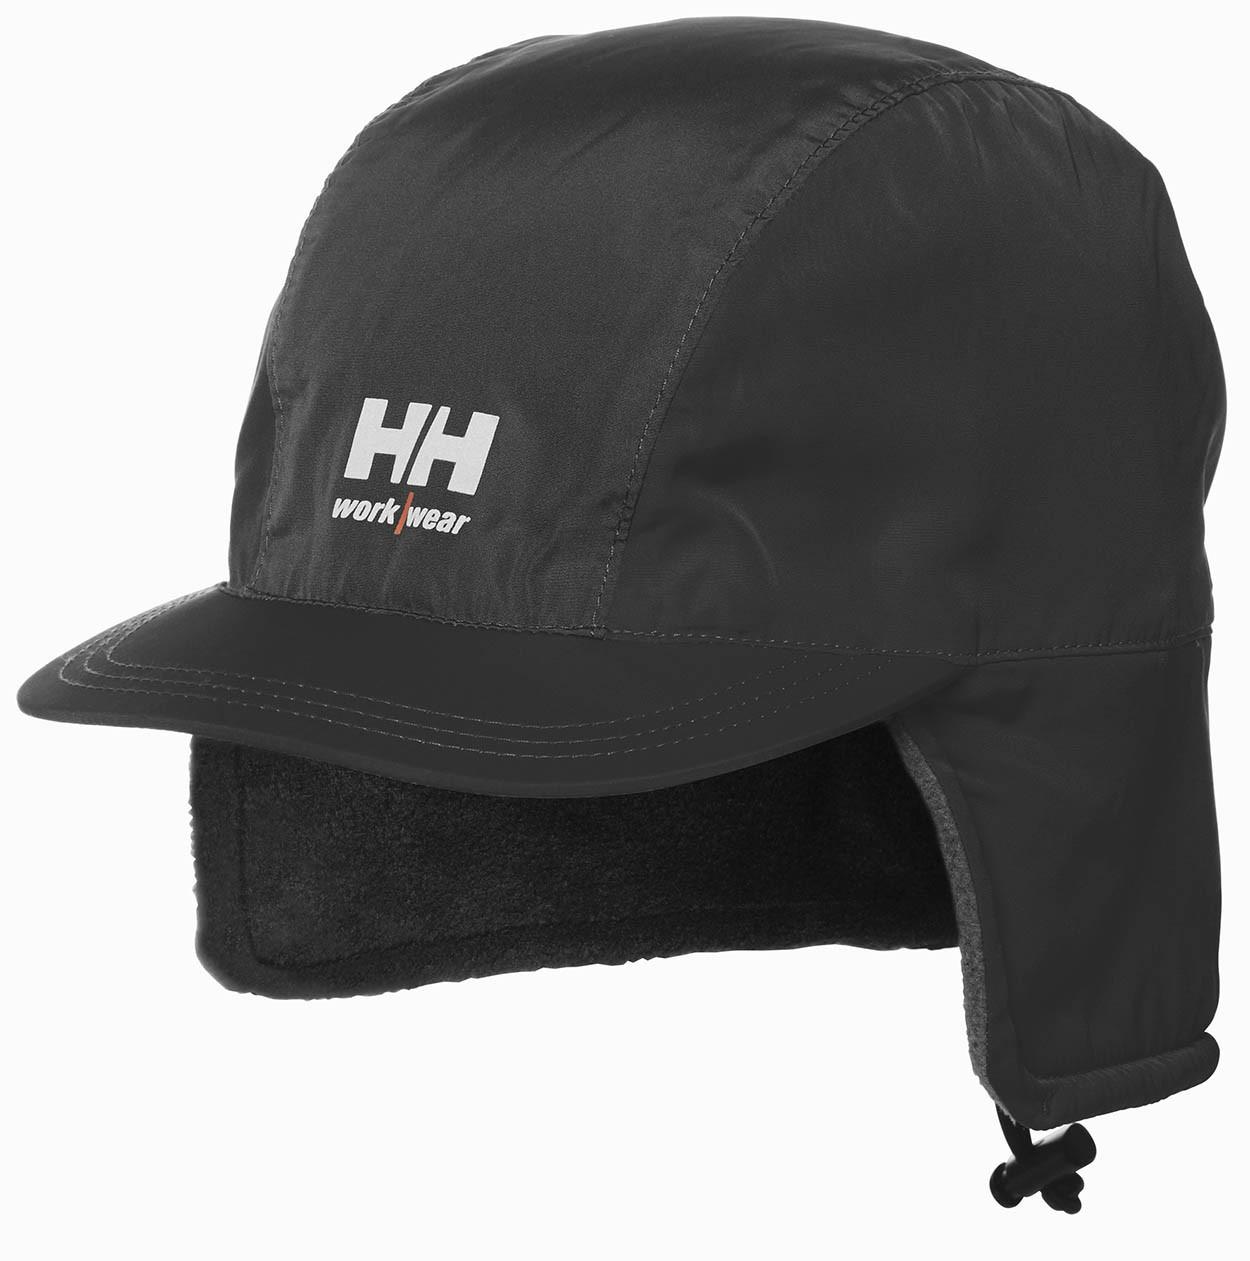 57cb1753a8d5a Helly Hansen 79880 Njord Hat - Workwear Accessories - Workwear ...